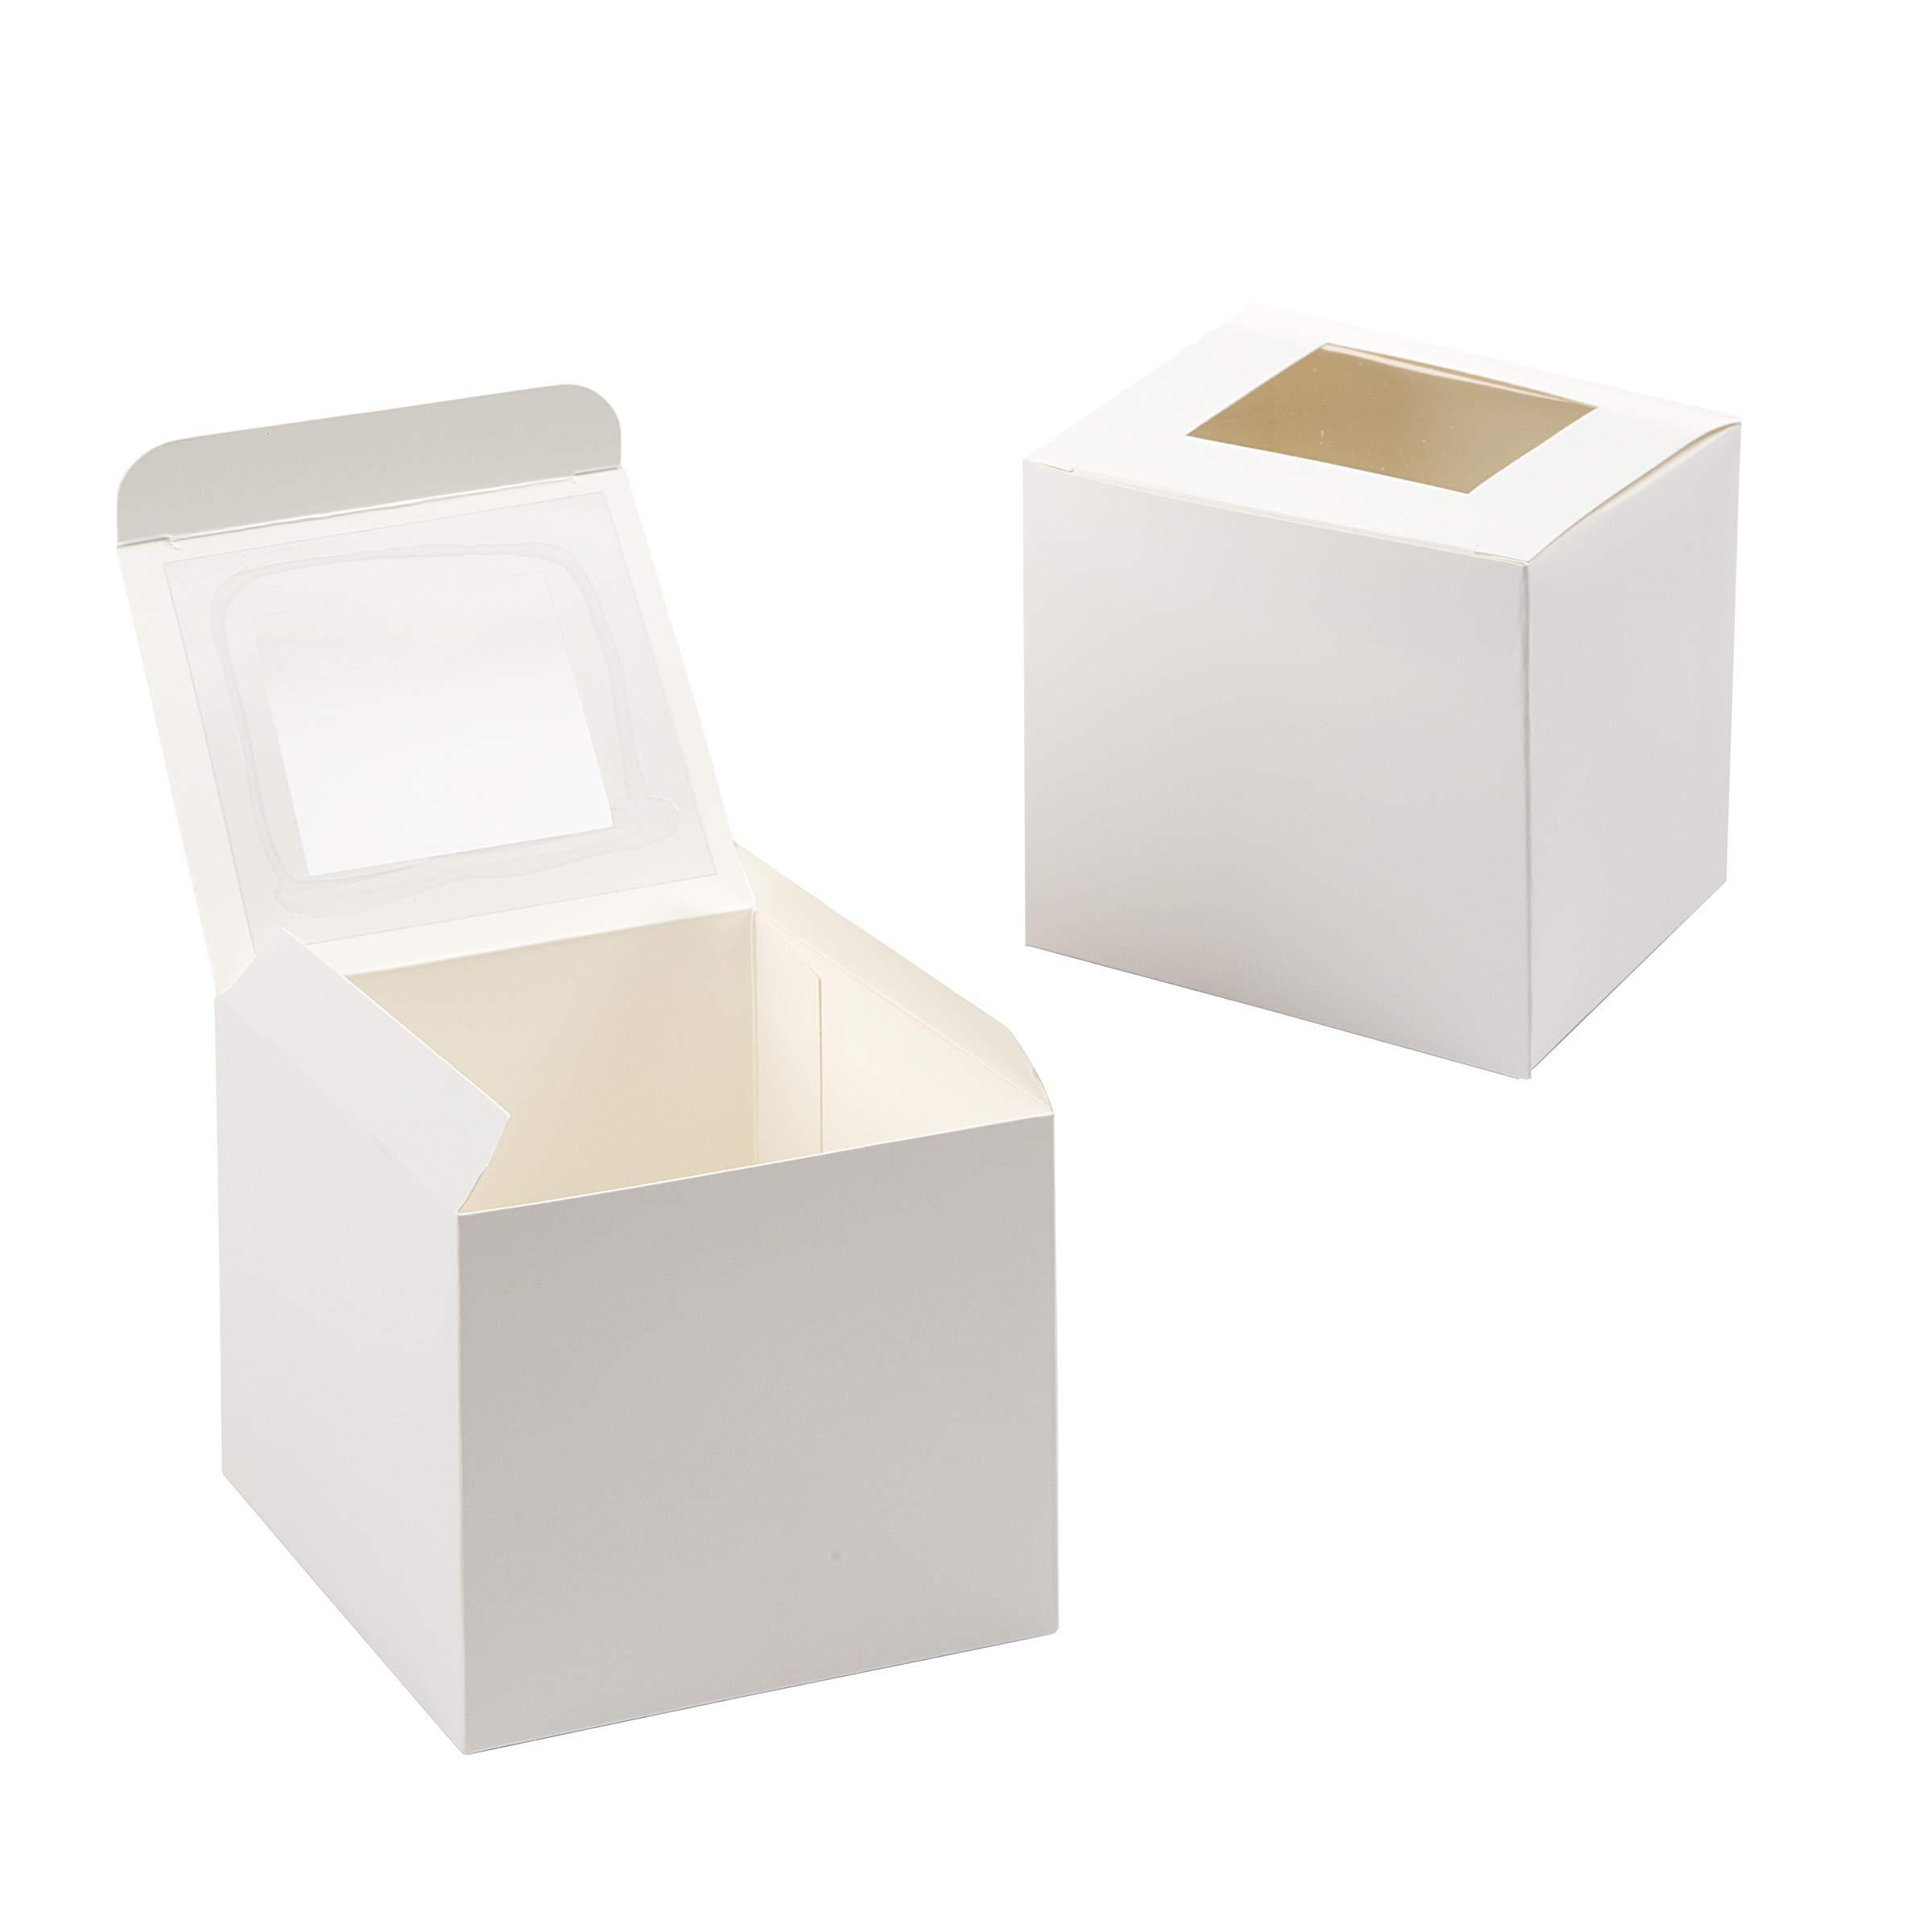 Darice Individual White Cupcake Box with Acetate Window, 12 pack